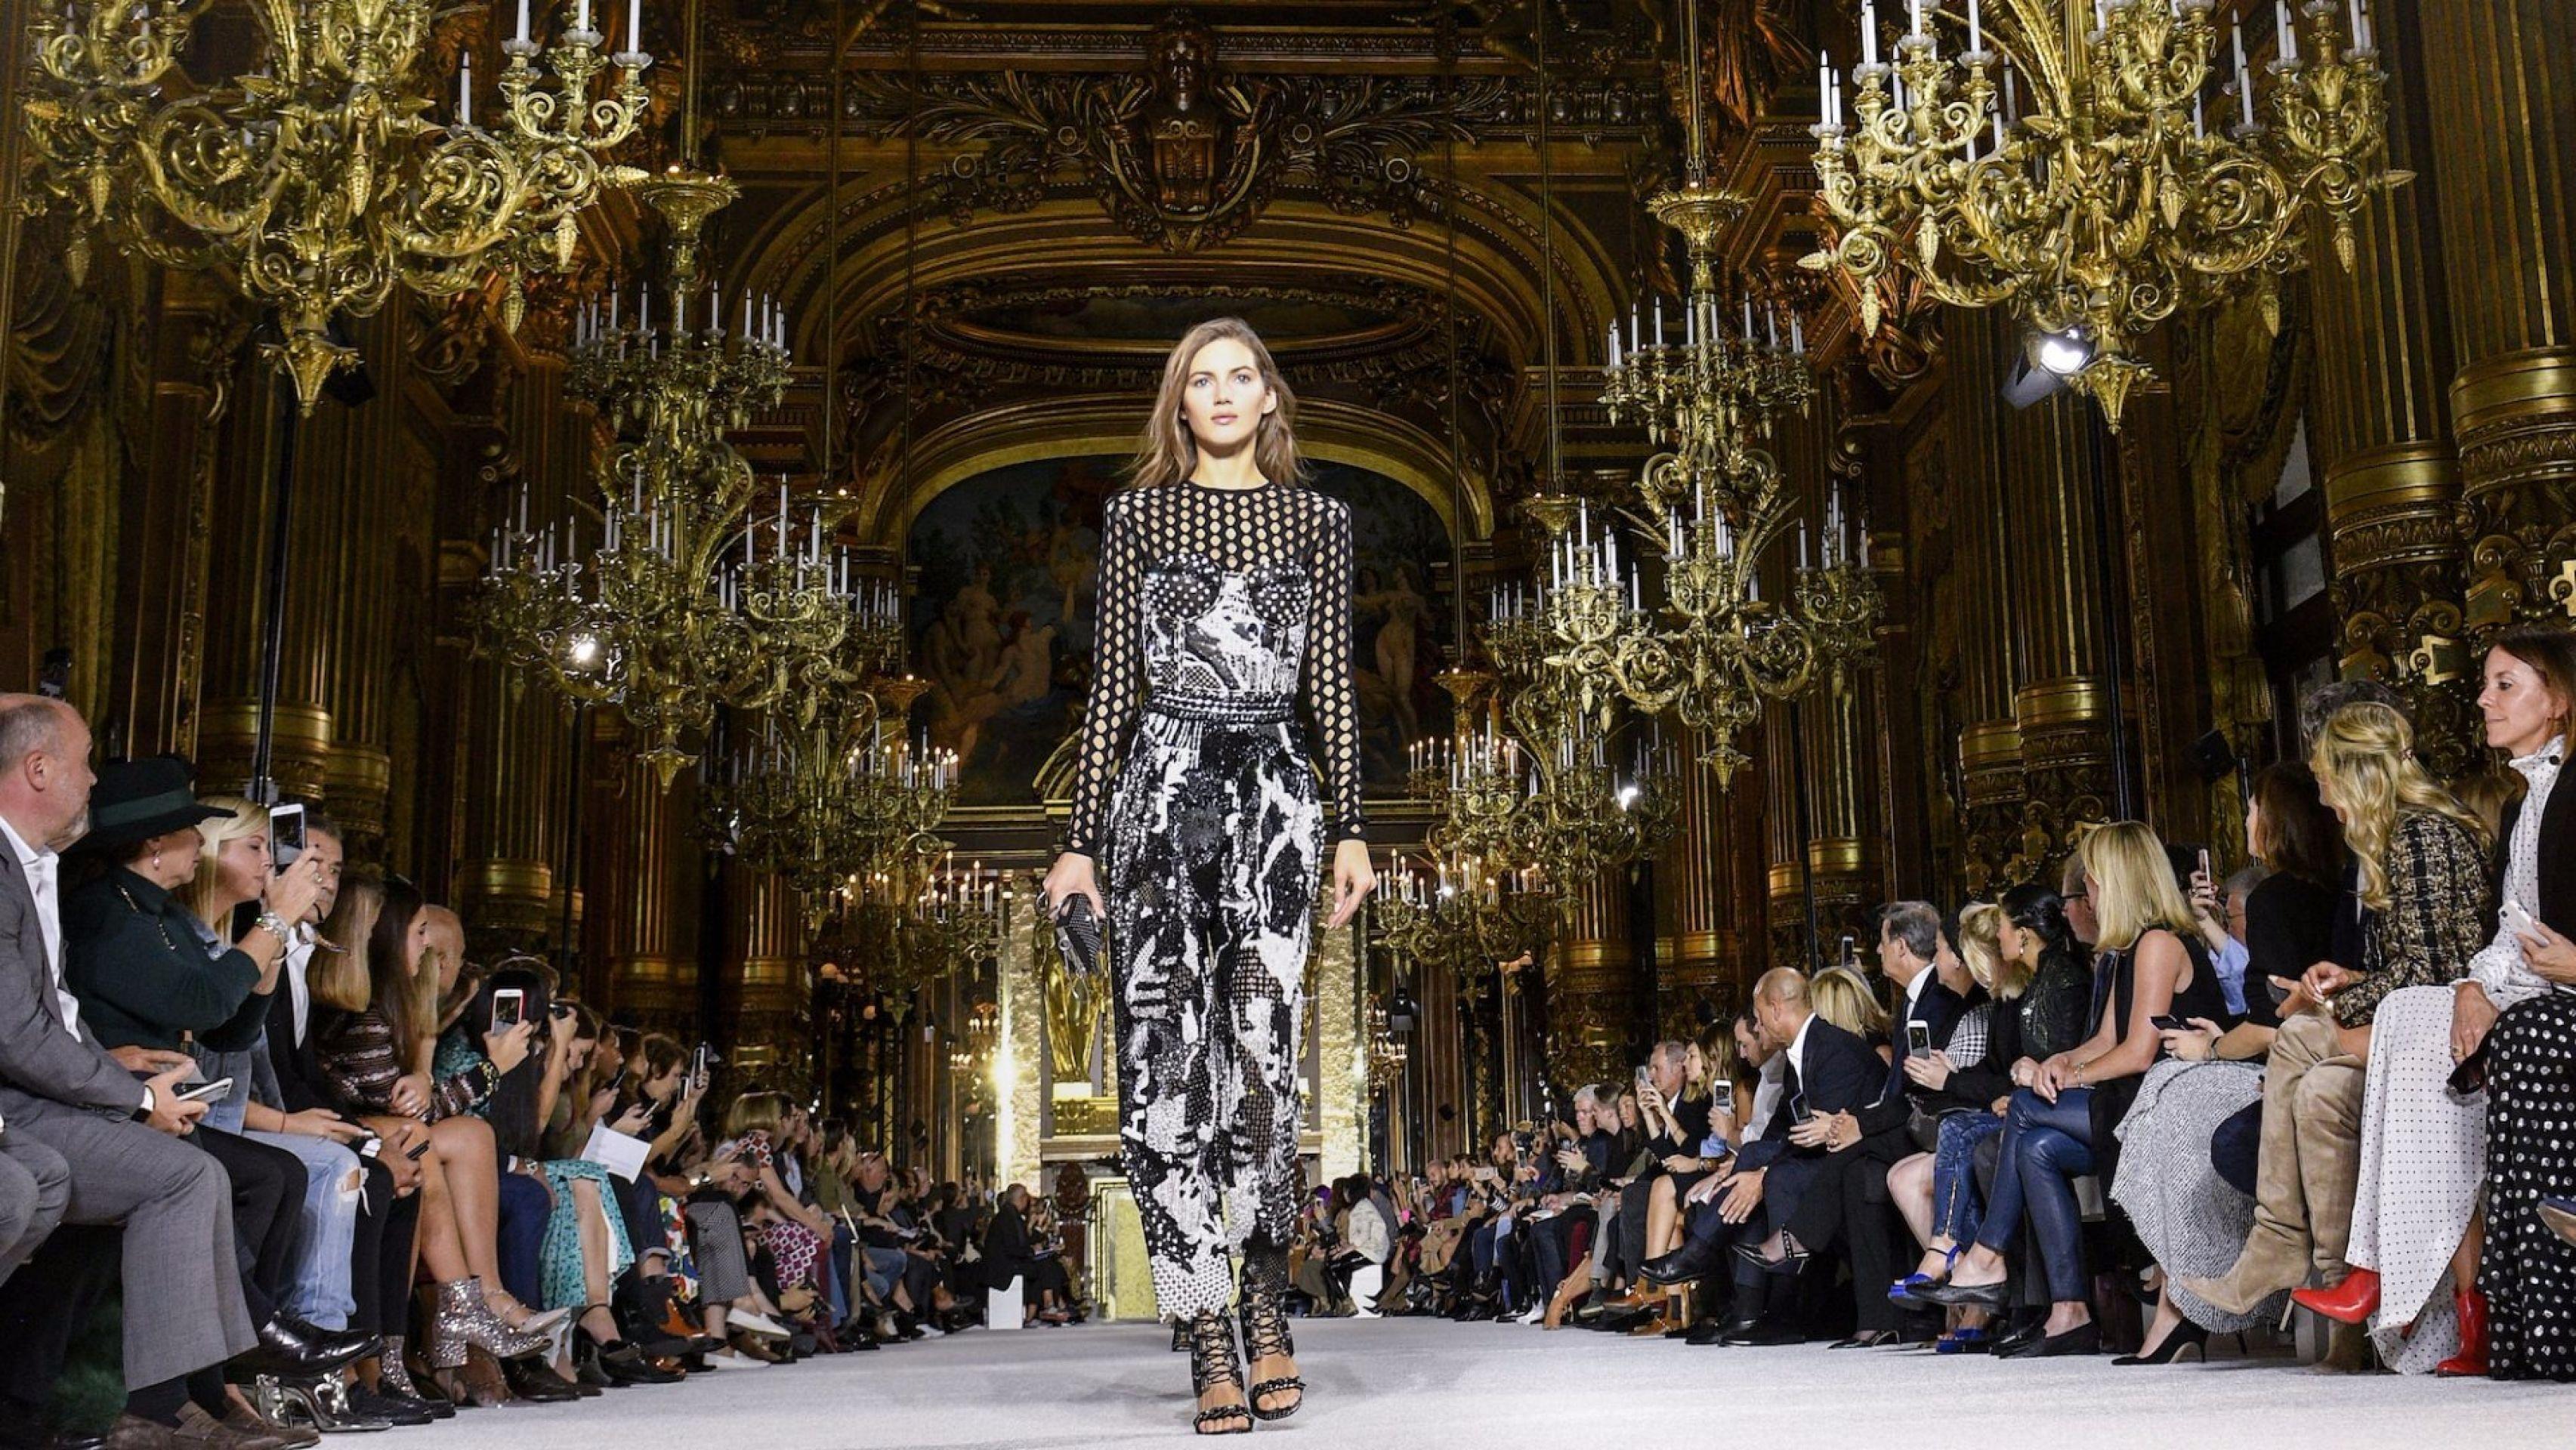 2019 Paris Fashion Week 25th February - 5th March